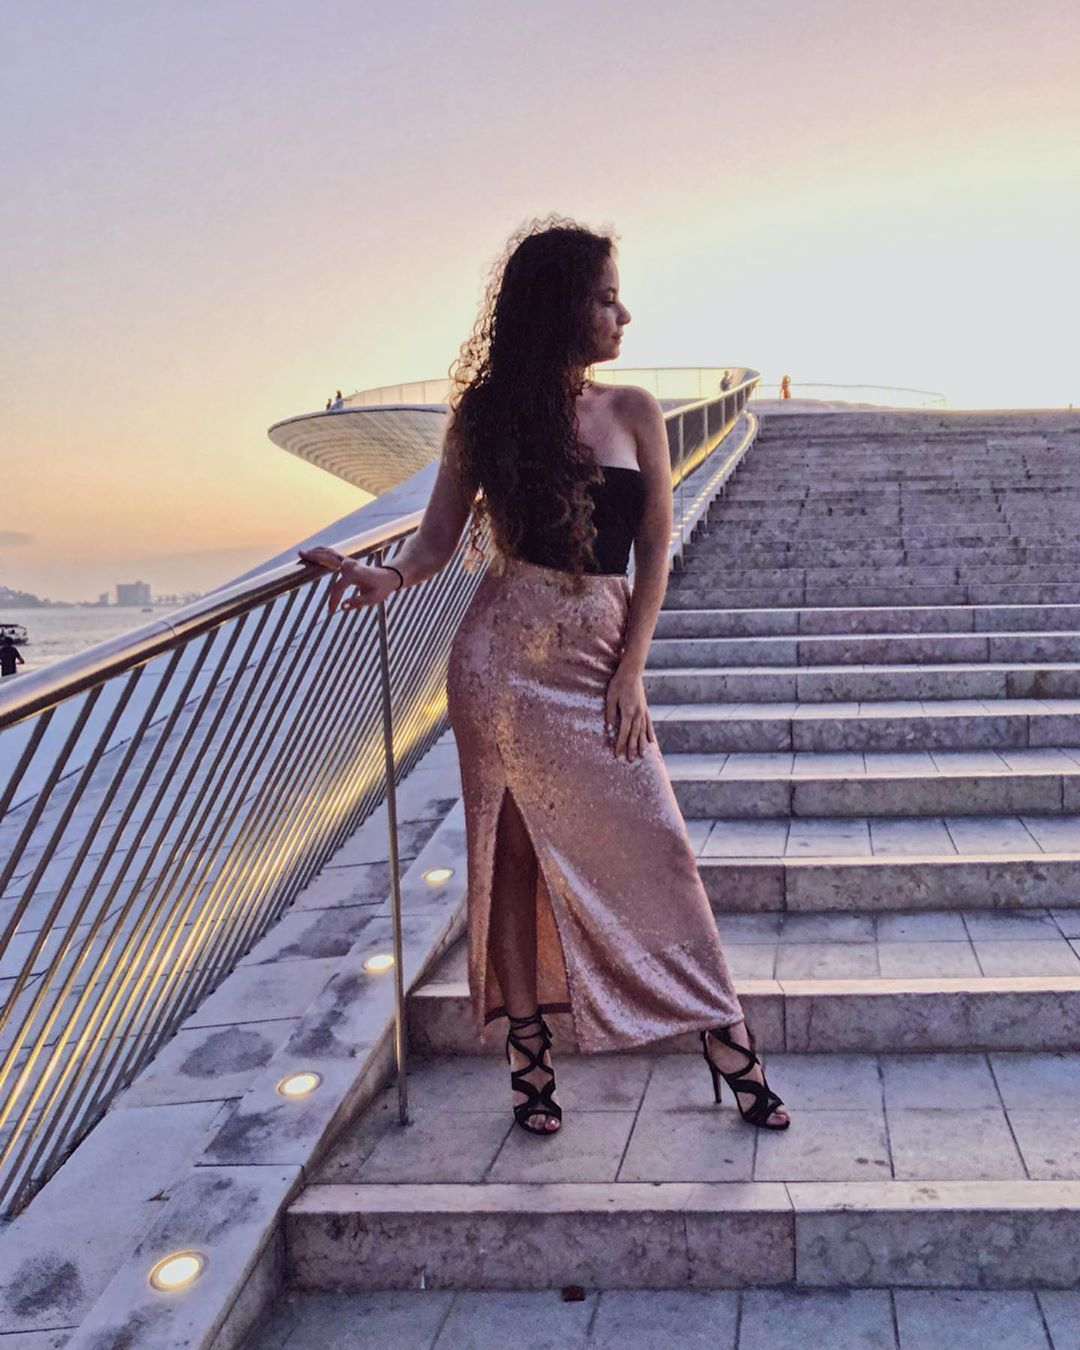 Lisboa e o pôr do sol 🌅... *e a saia que encontrei na @zara  Obrigada pela paciência amor 📸😅 @adrianodimulo . . . . . . . . #style #daily #otd #outfitsideas #outfits #instagramer #fashiontrends #curl #curls #blueeyes #eyeshadow #makeuplover #hairstyle #curlyhairstyle #instadaily #influencers #lipstick💄 #portugal #cachos #summeroutfit #bershkastyle #heaven #makeuplover #makeup #makeupoftheday #iphone8plus #nightout